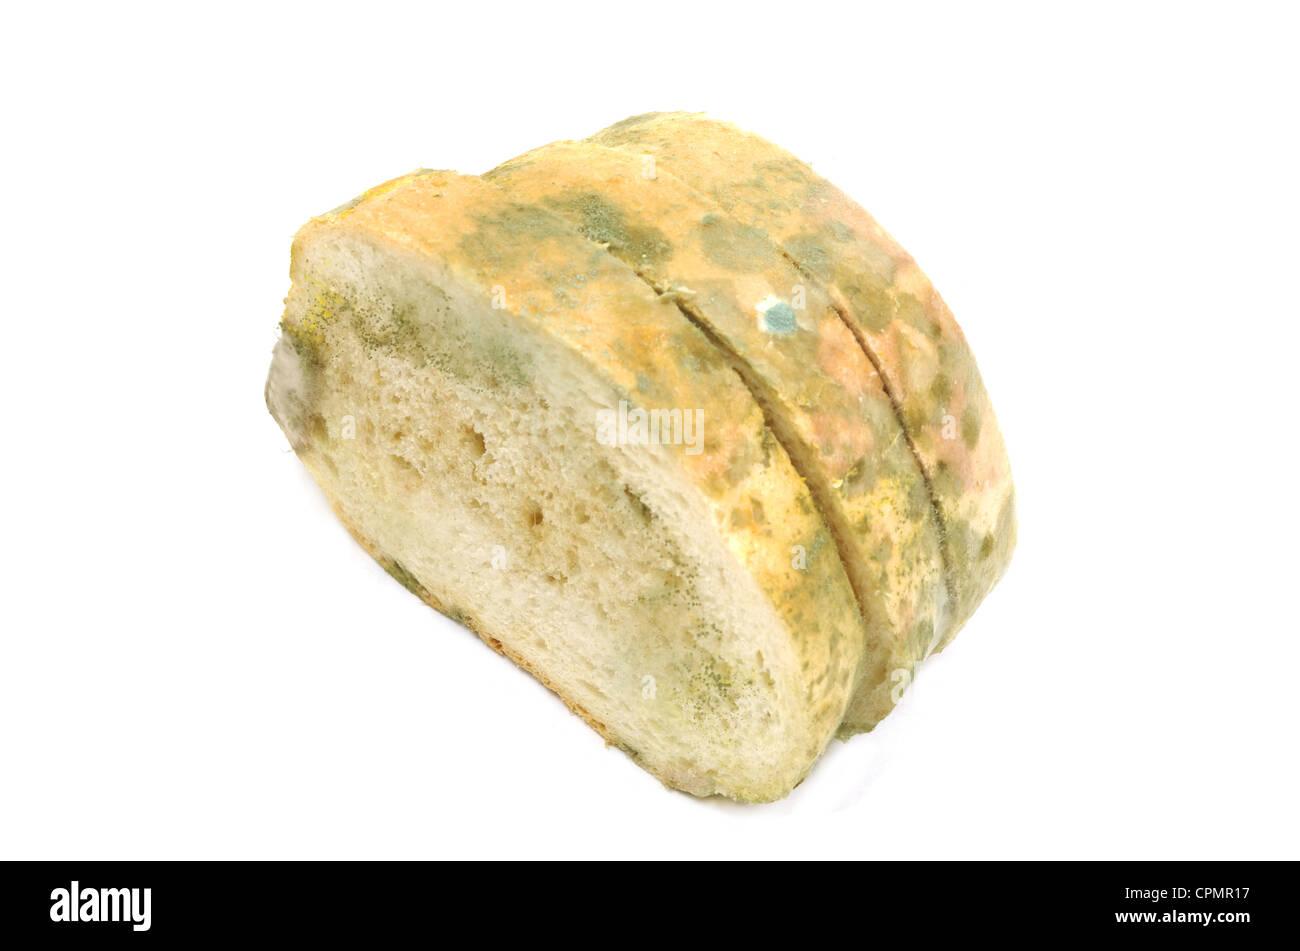 Rebanadas de pan moldeado aislado en blanco Foto de stock